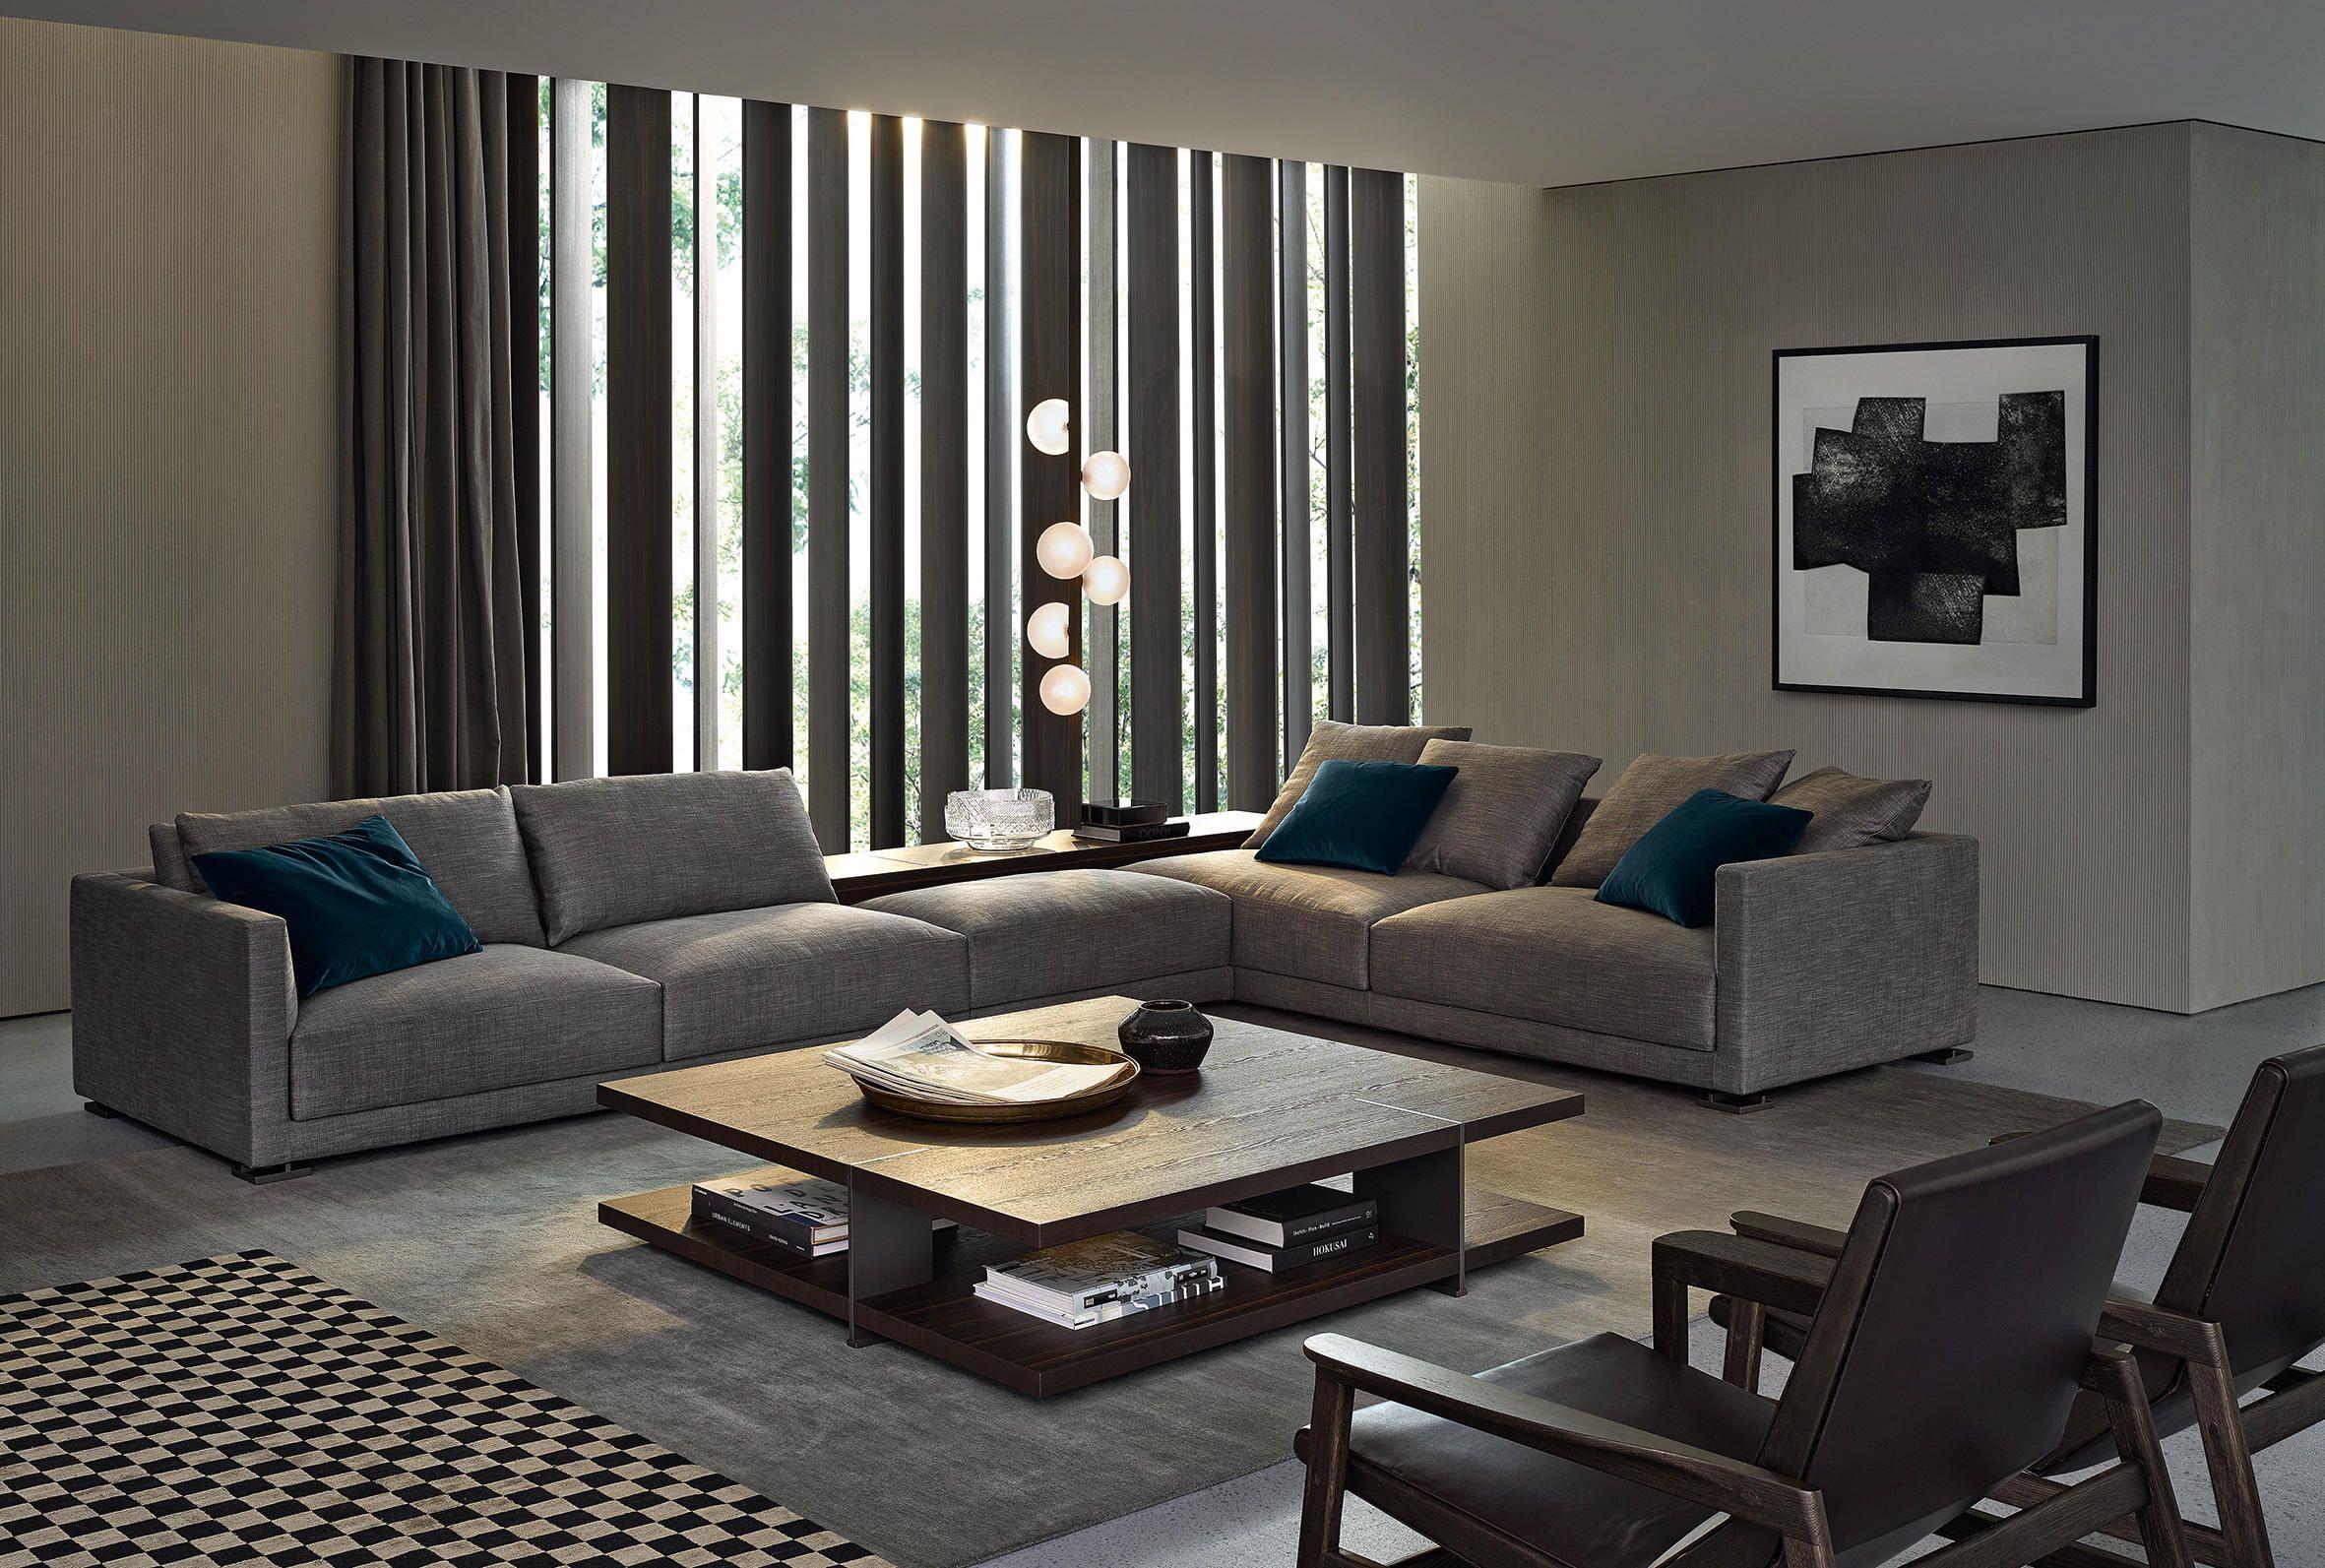 Bristol Sofa By Poliform Sofas